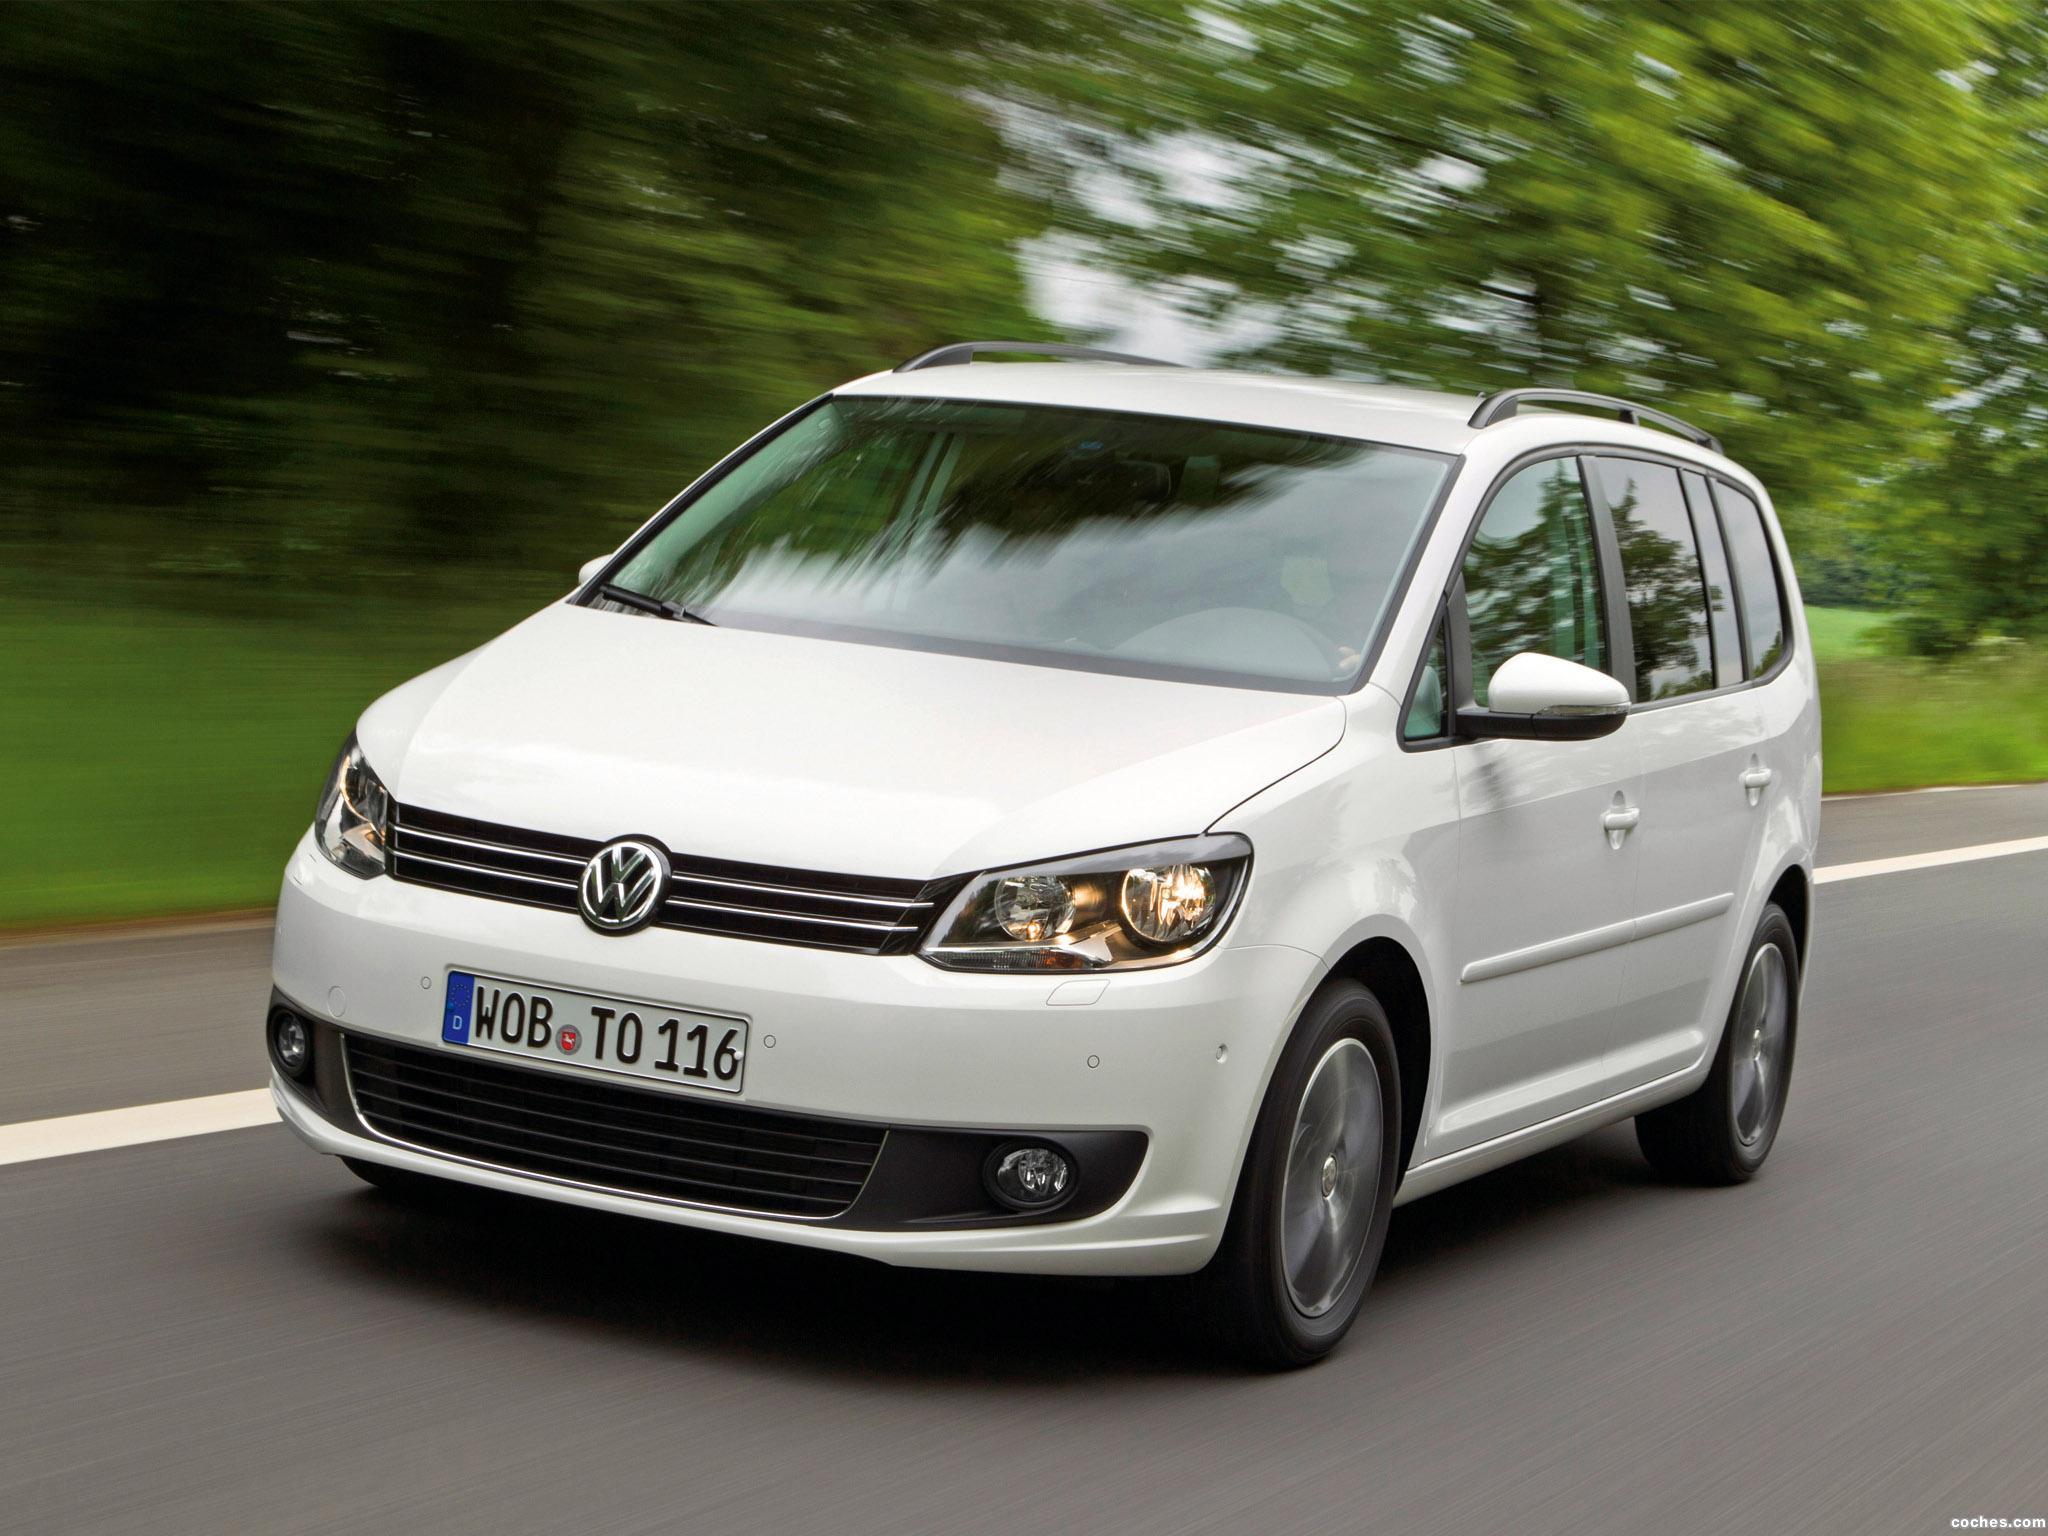 Foto 3 de Volkswagen Touran BlueMotion 2010